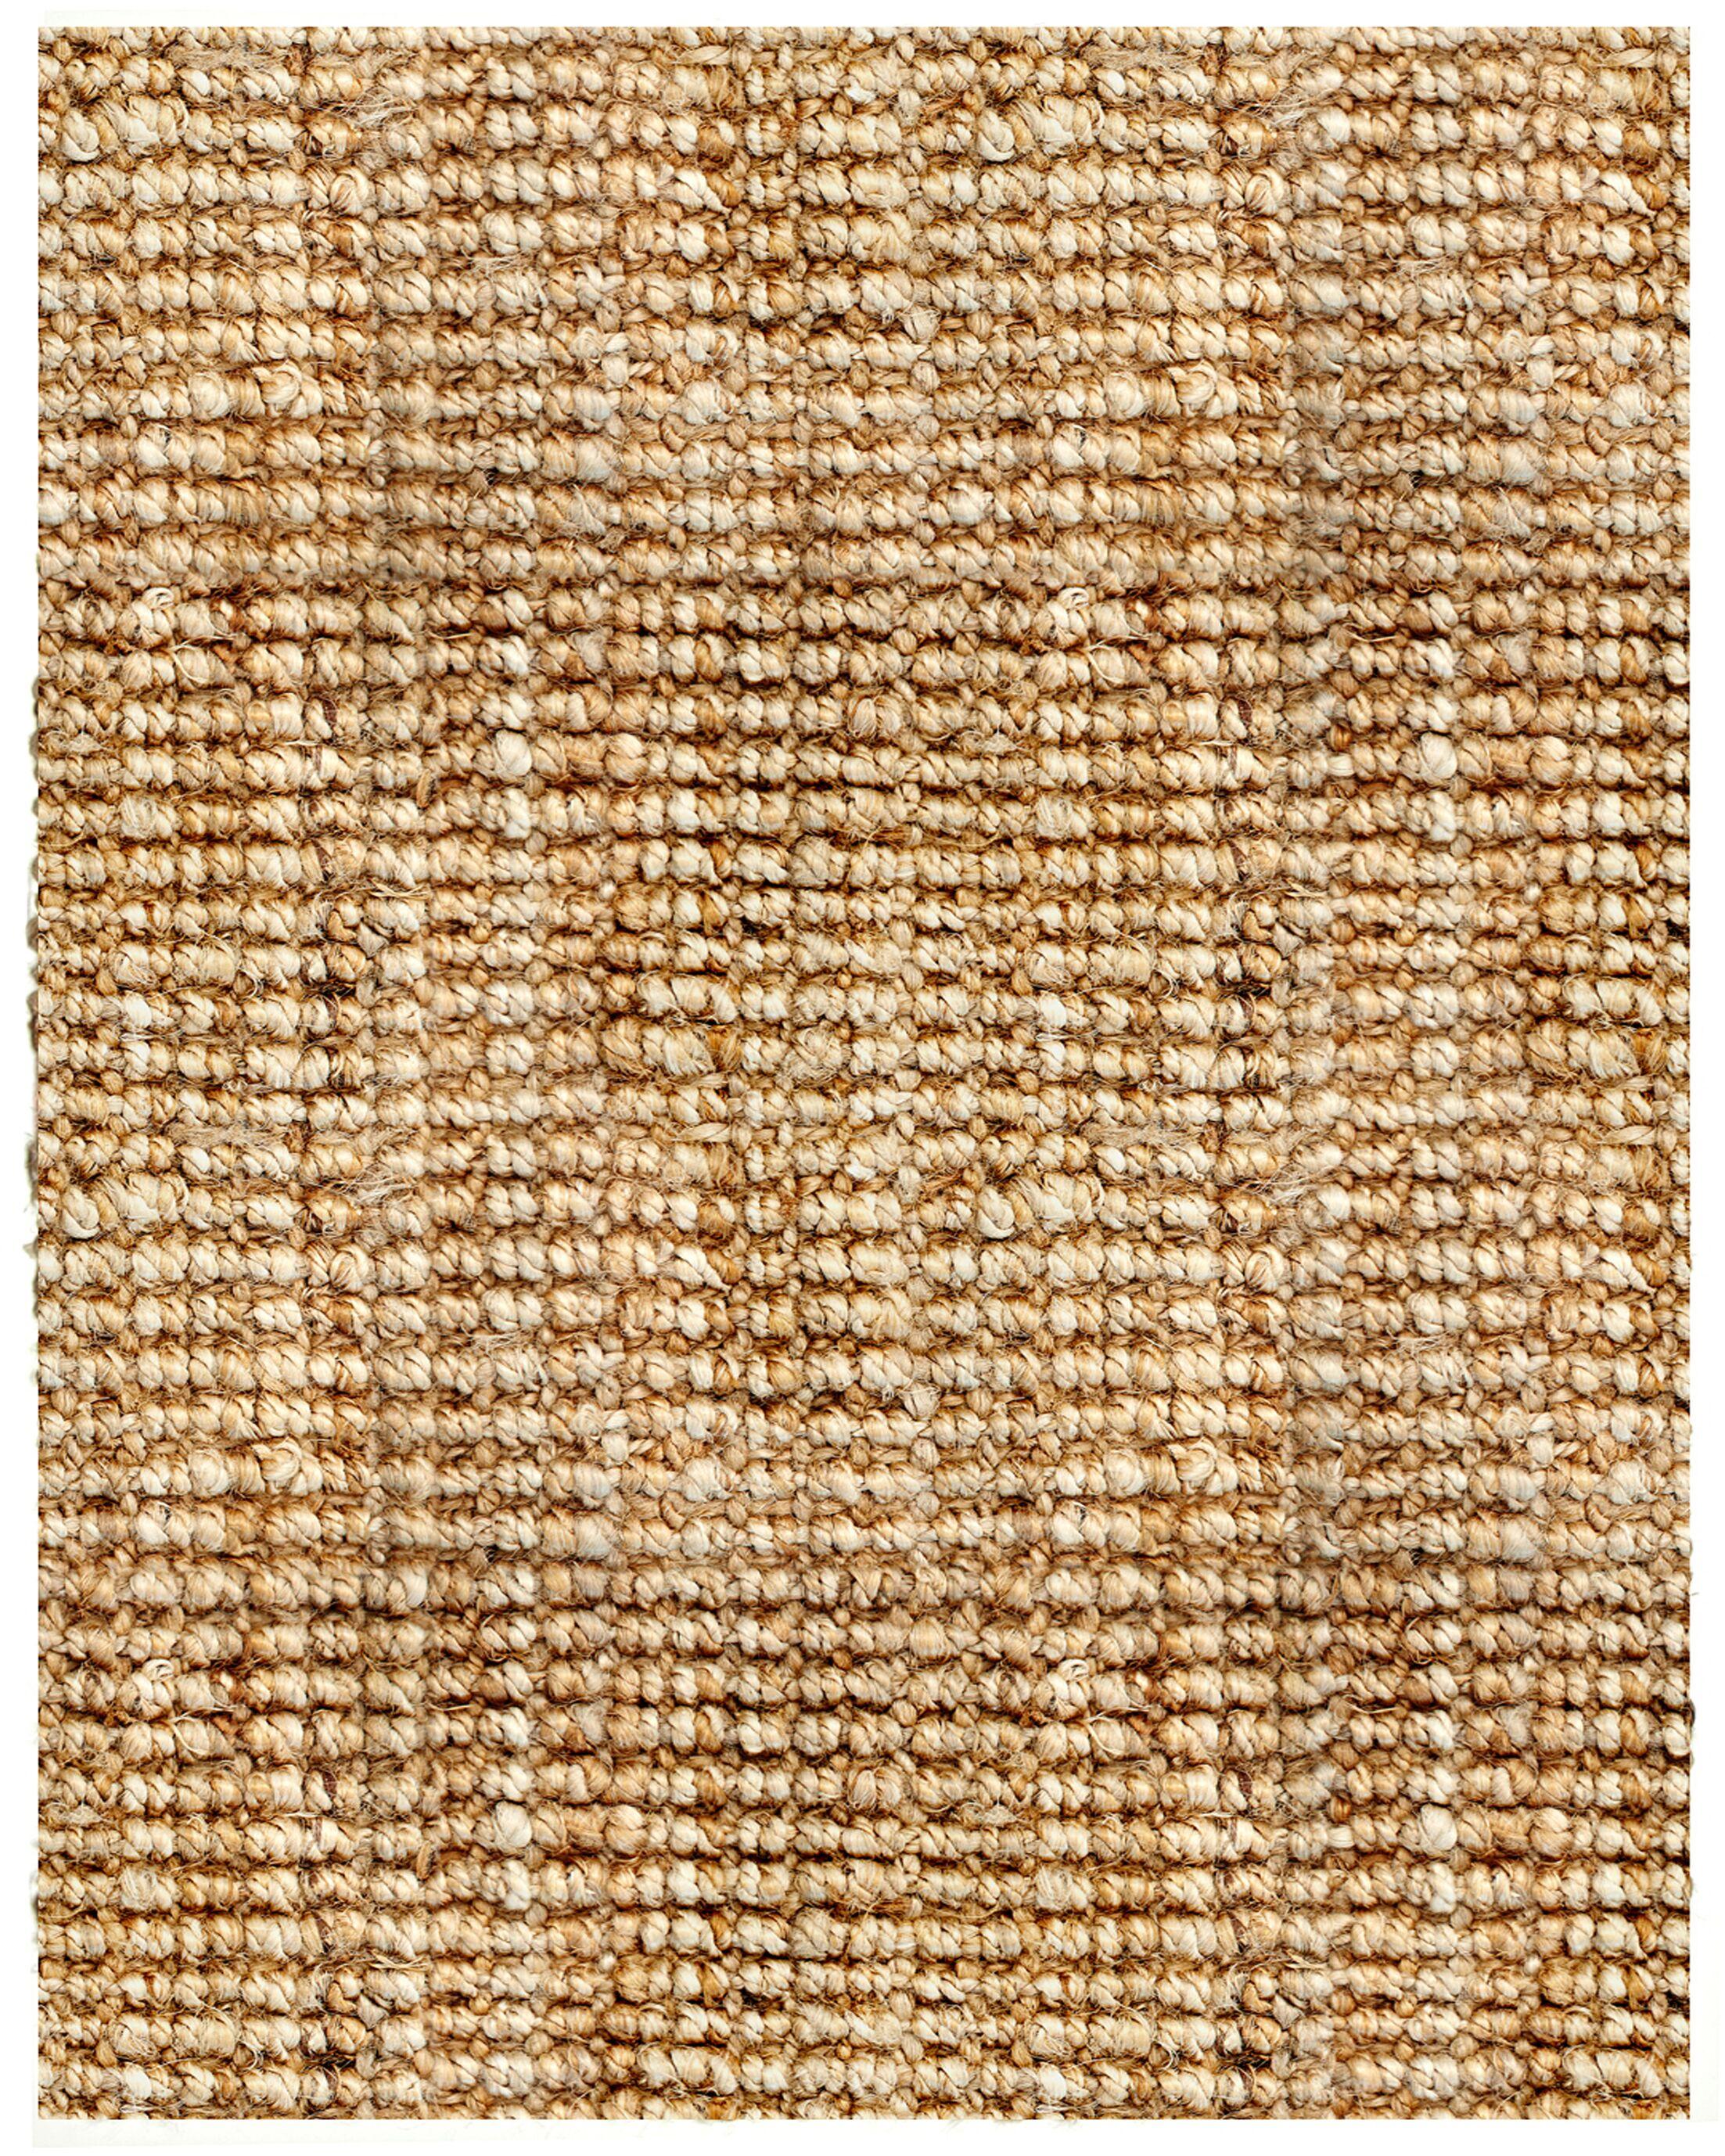 Helvetia Hand-Woven Brown Area Rug Rug Size: Rectangle 8' x 10'